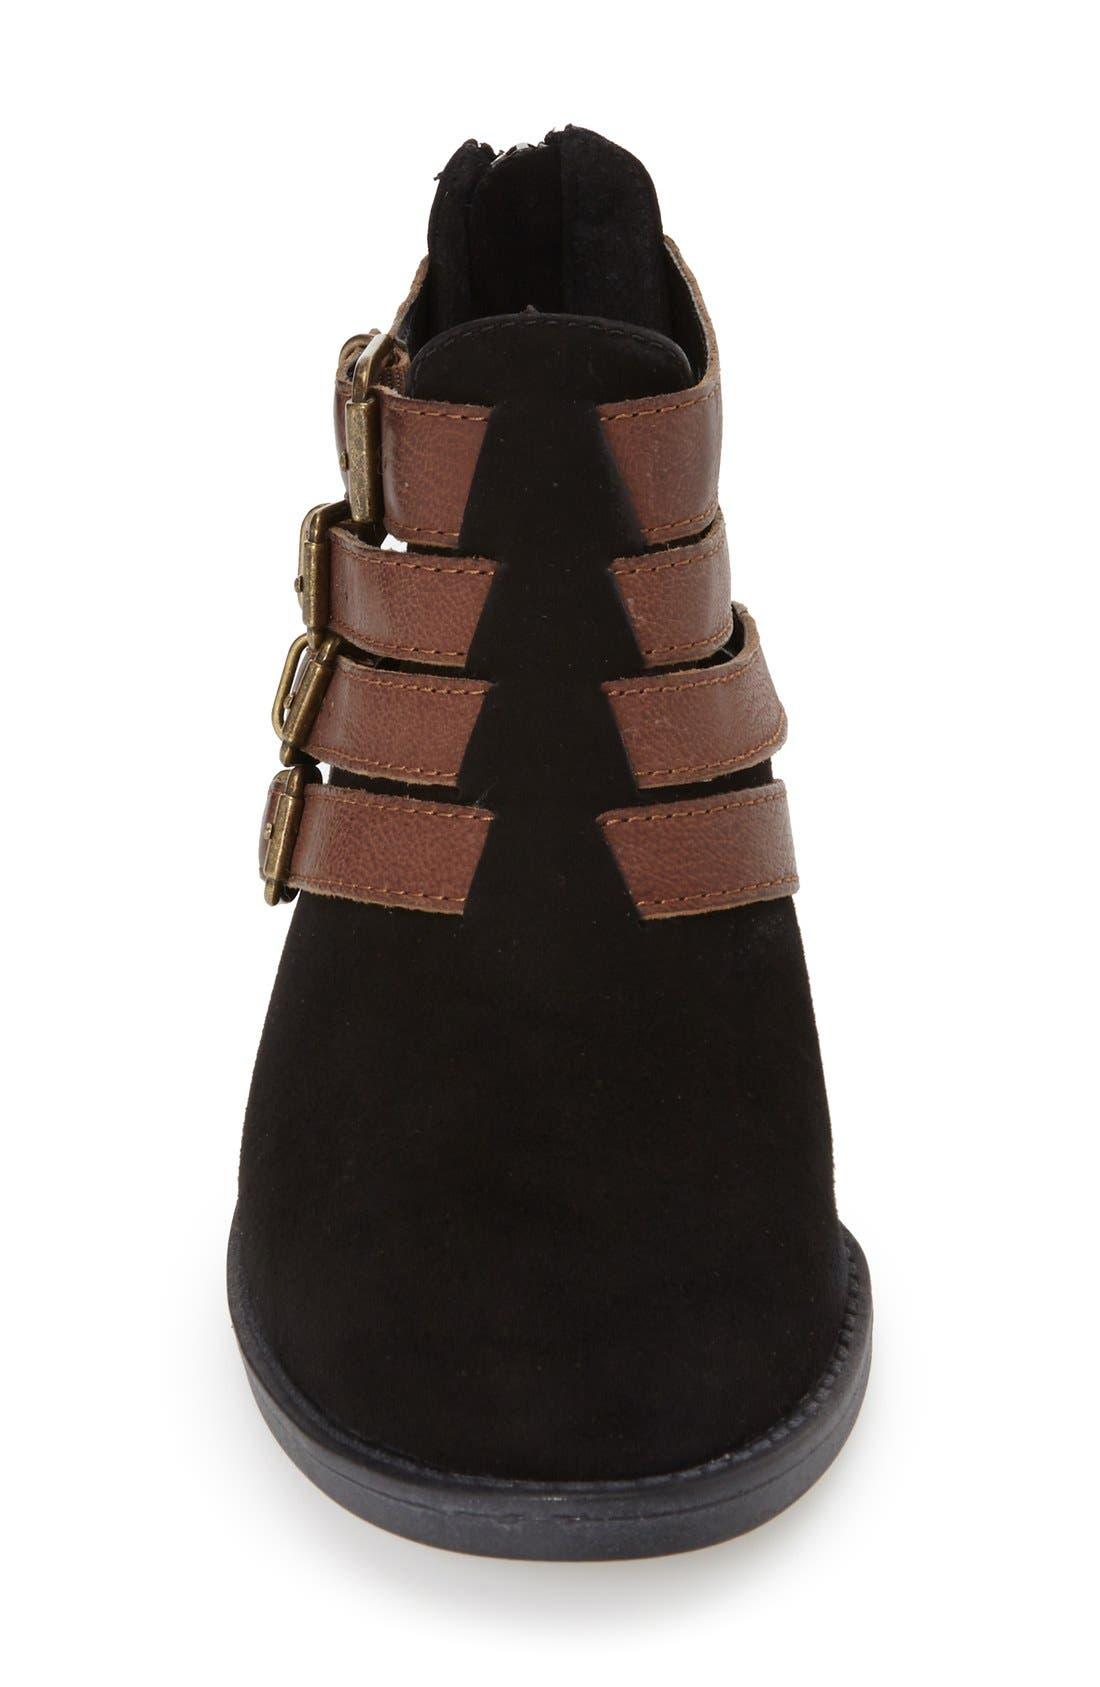 Alternate Image 3  - Bella Vita 'Ronan' Buckle Leather Bootie (Women) (Online Only)